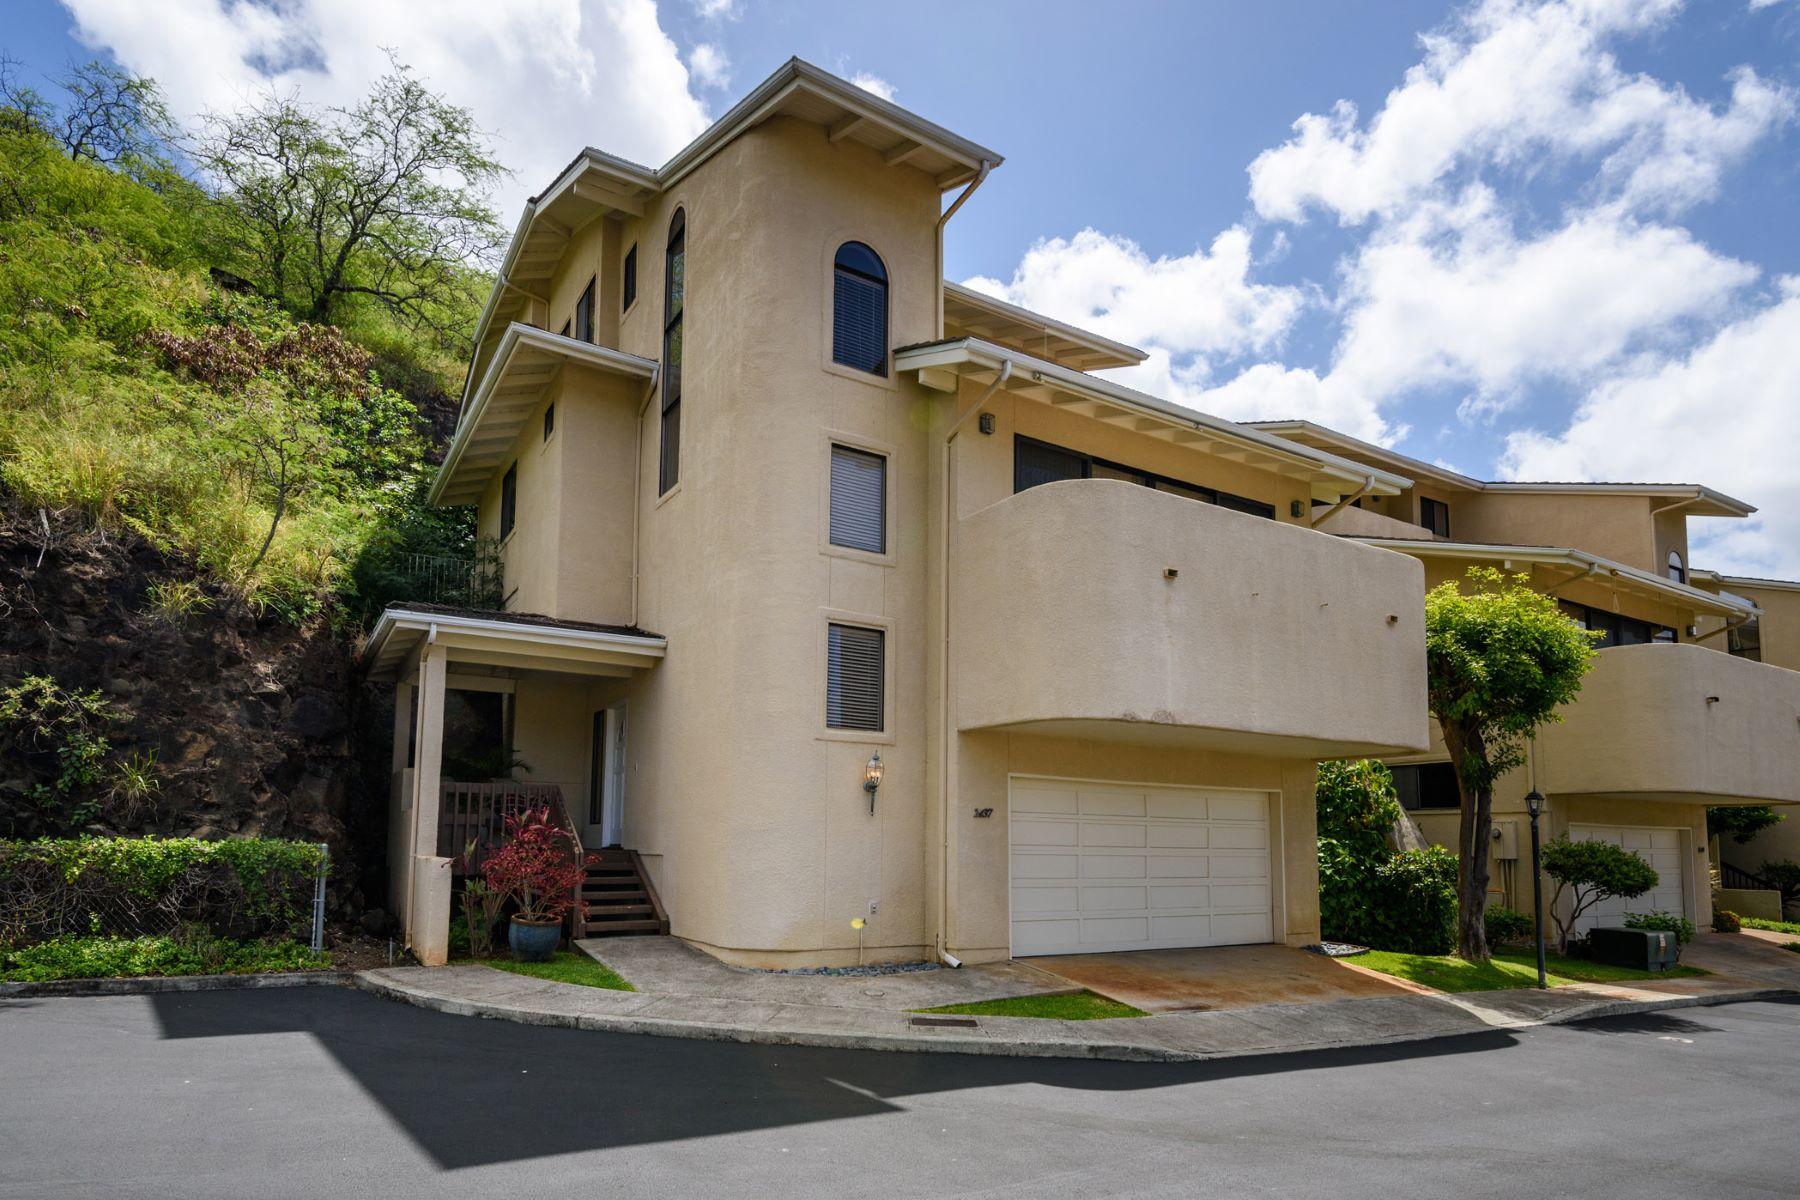 Maison unifamiliale pour l Vente à Exclusive Kalani Iki Hideaway 1437 Hoakoa Place #10 Kalani Iki, Honolulu, Hawaii, 96821 États-Unis